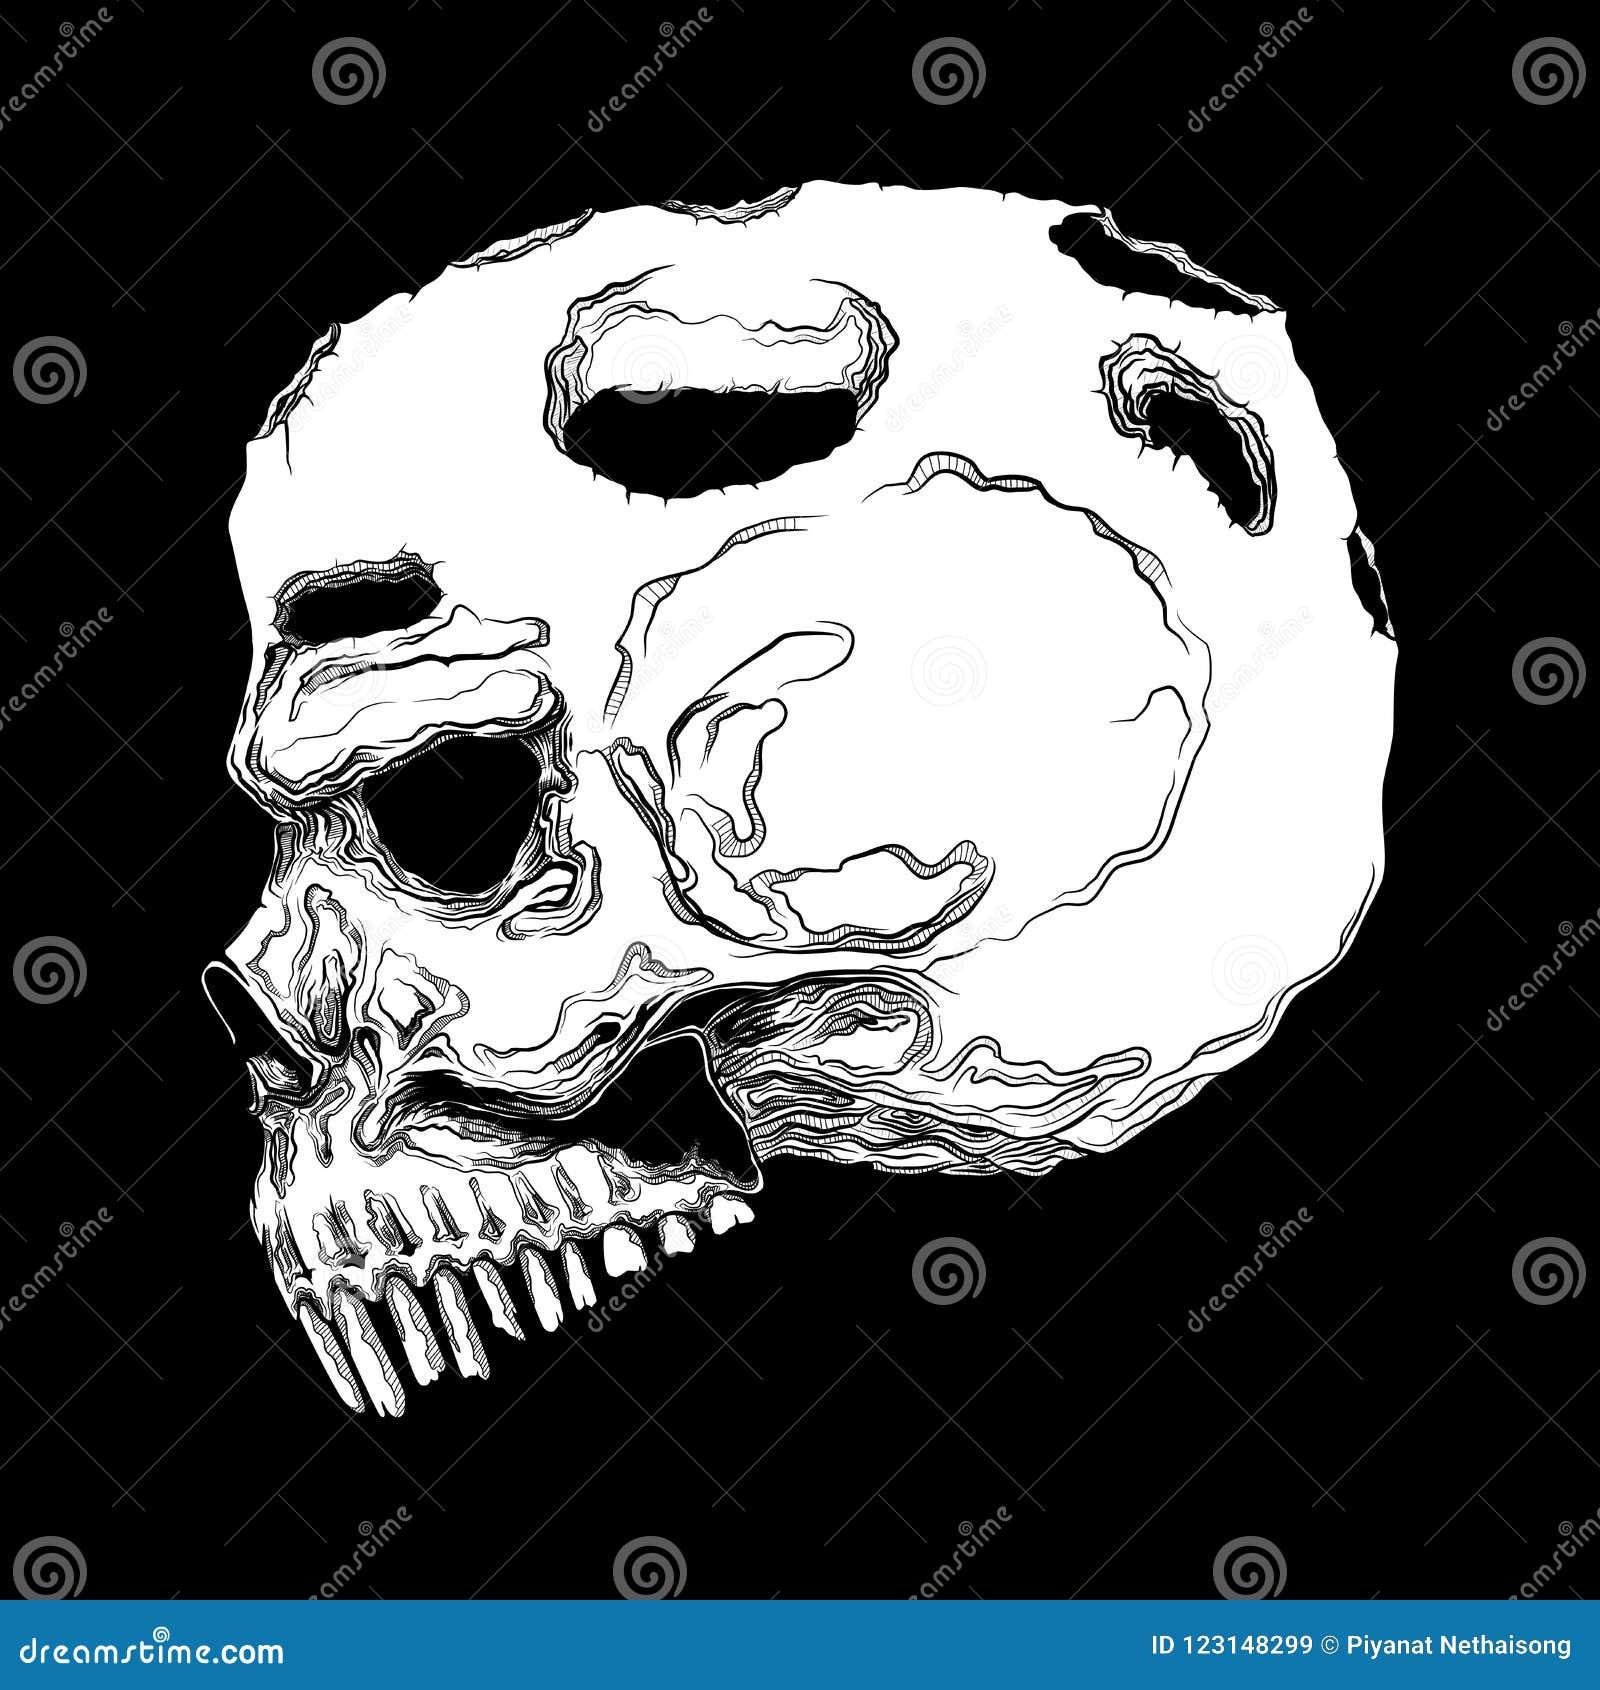 Anatomically Correct Human Skull Isolated Hand Drawn Line Art